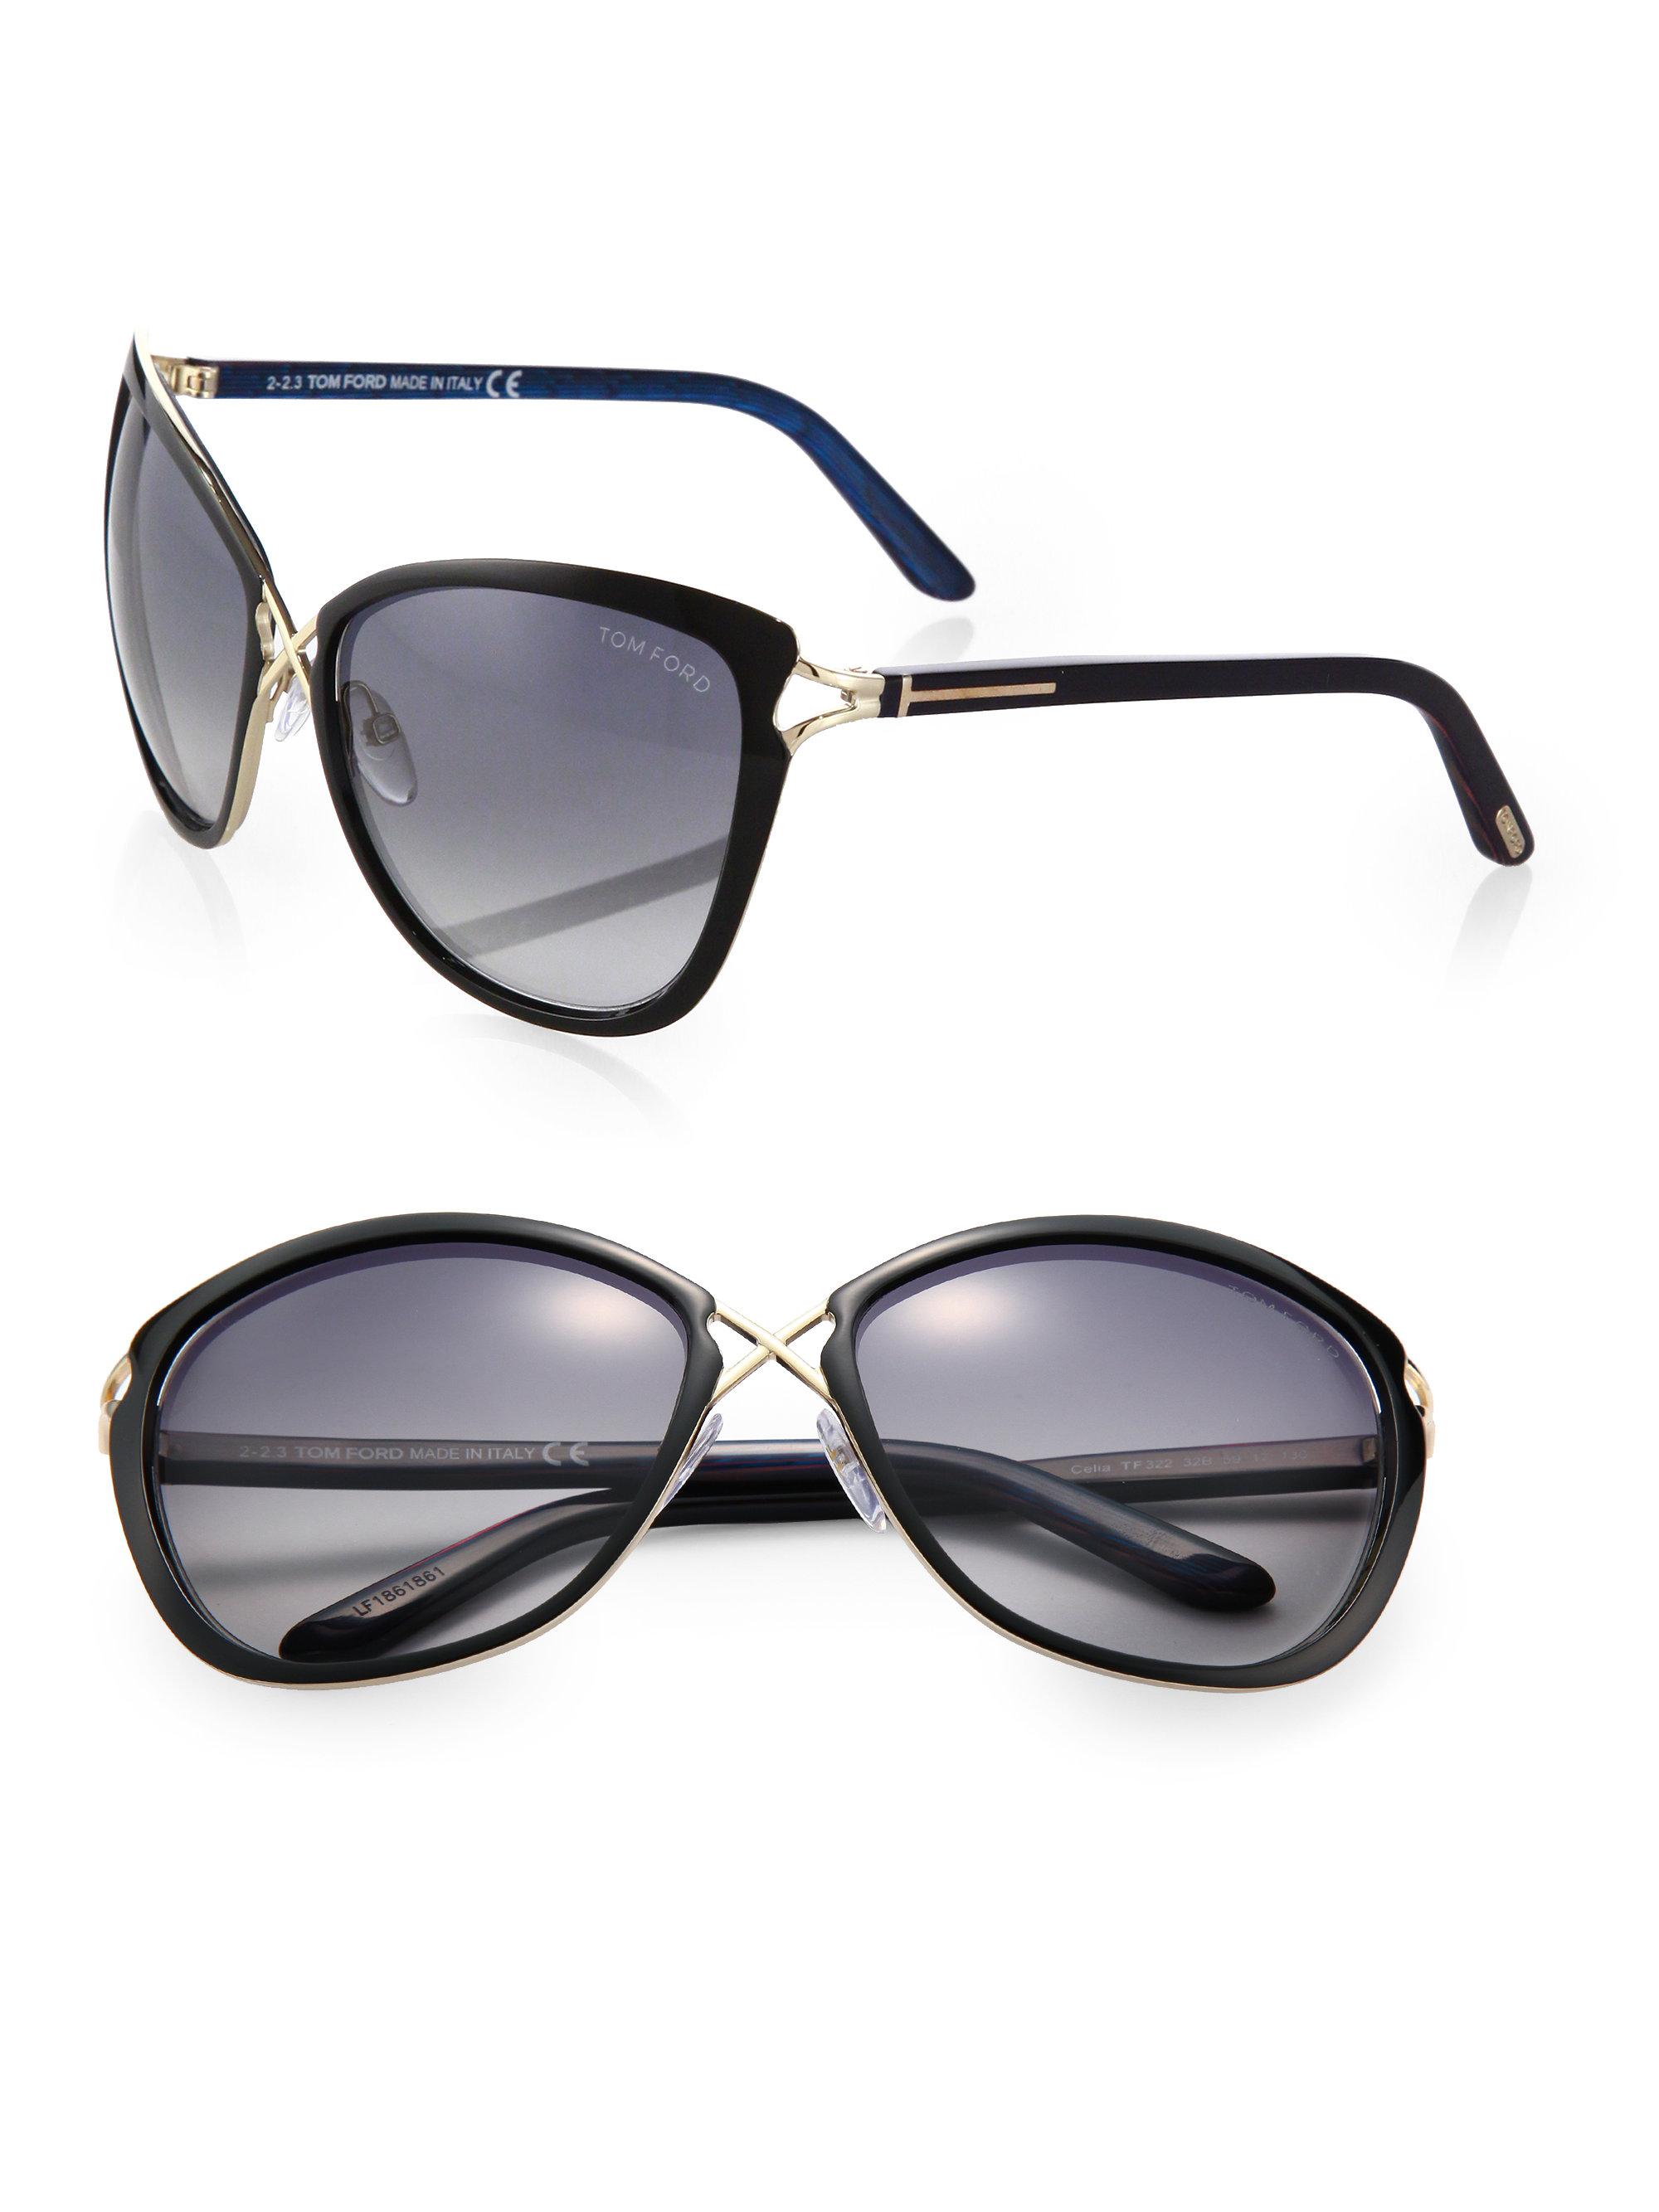 5c41552676ffa Celia Eye Metal Ford In Bridge Lyst Cat s Sunglasses Tom Black UqSxYYP